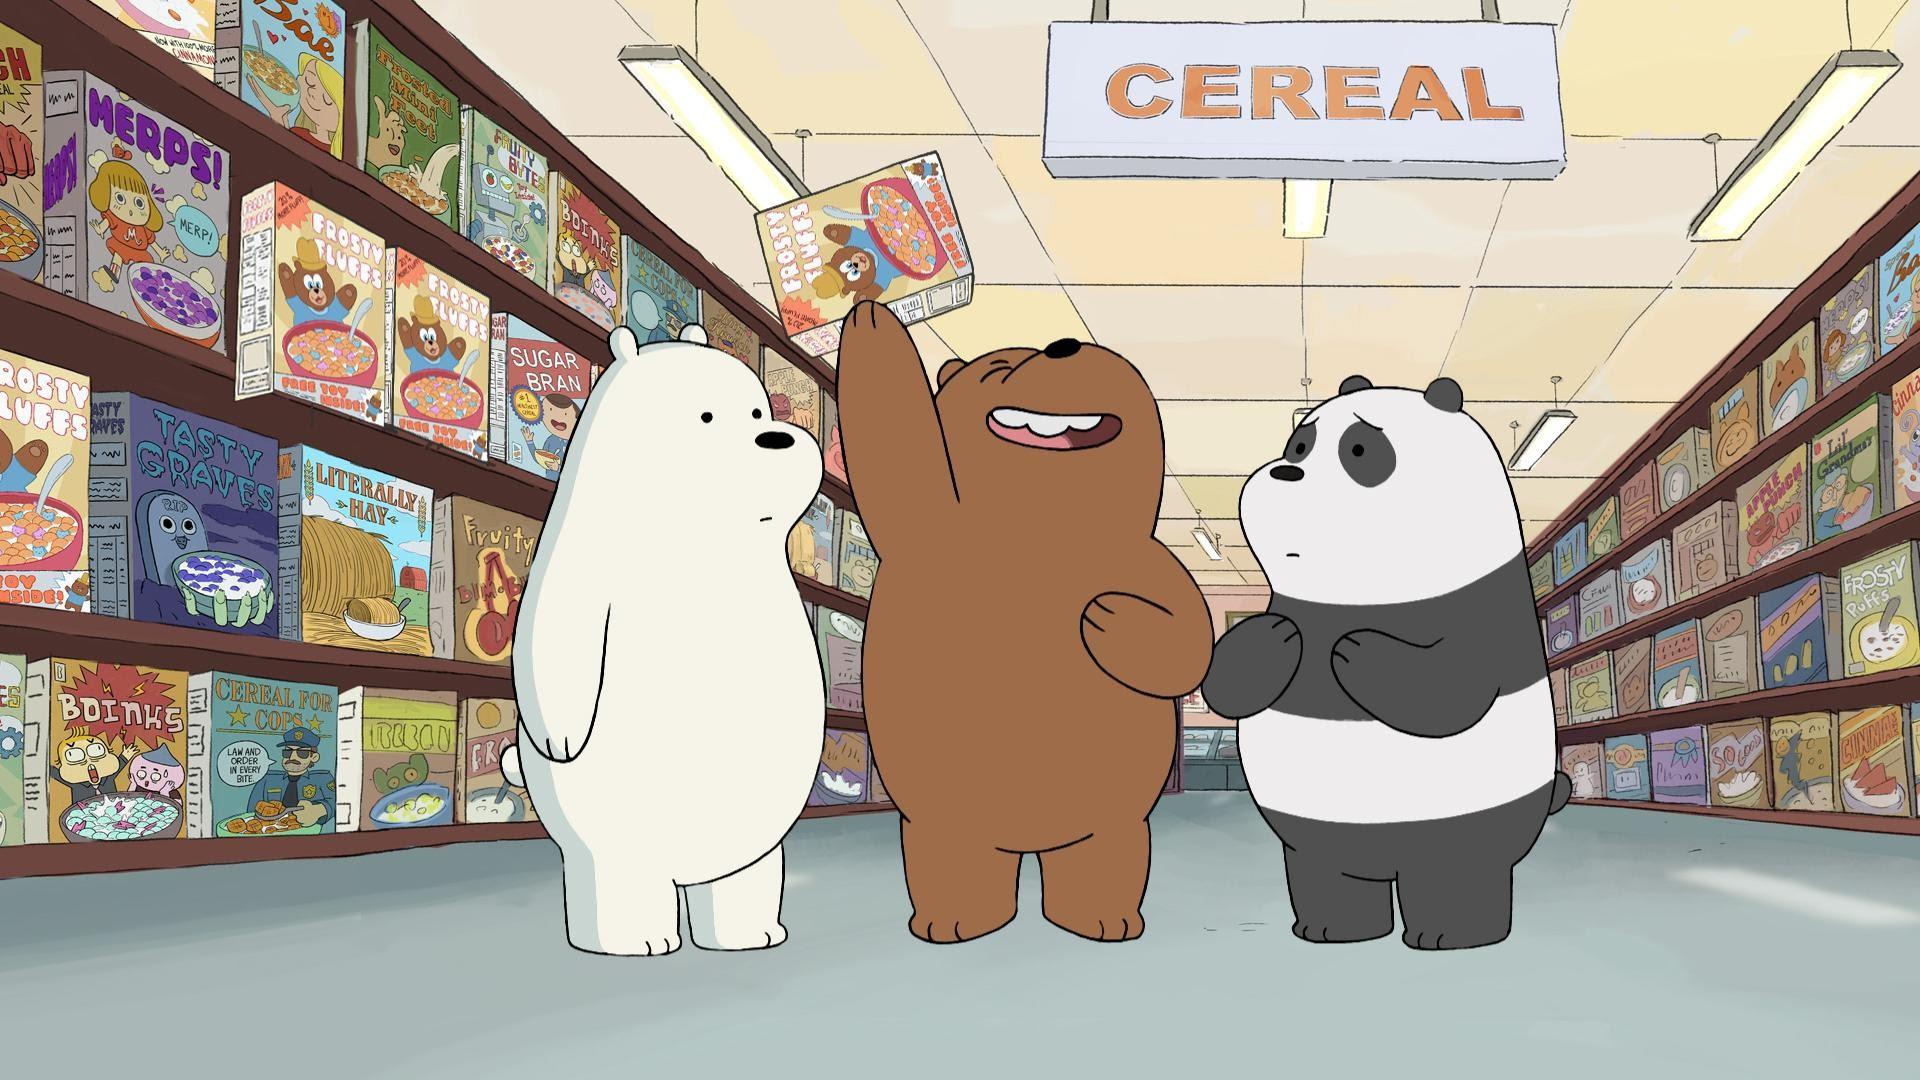 Gambar Aesthetic Kartun We Bare Bears Dunia Gambar